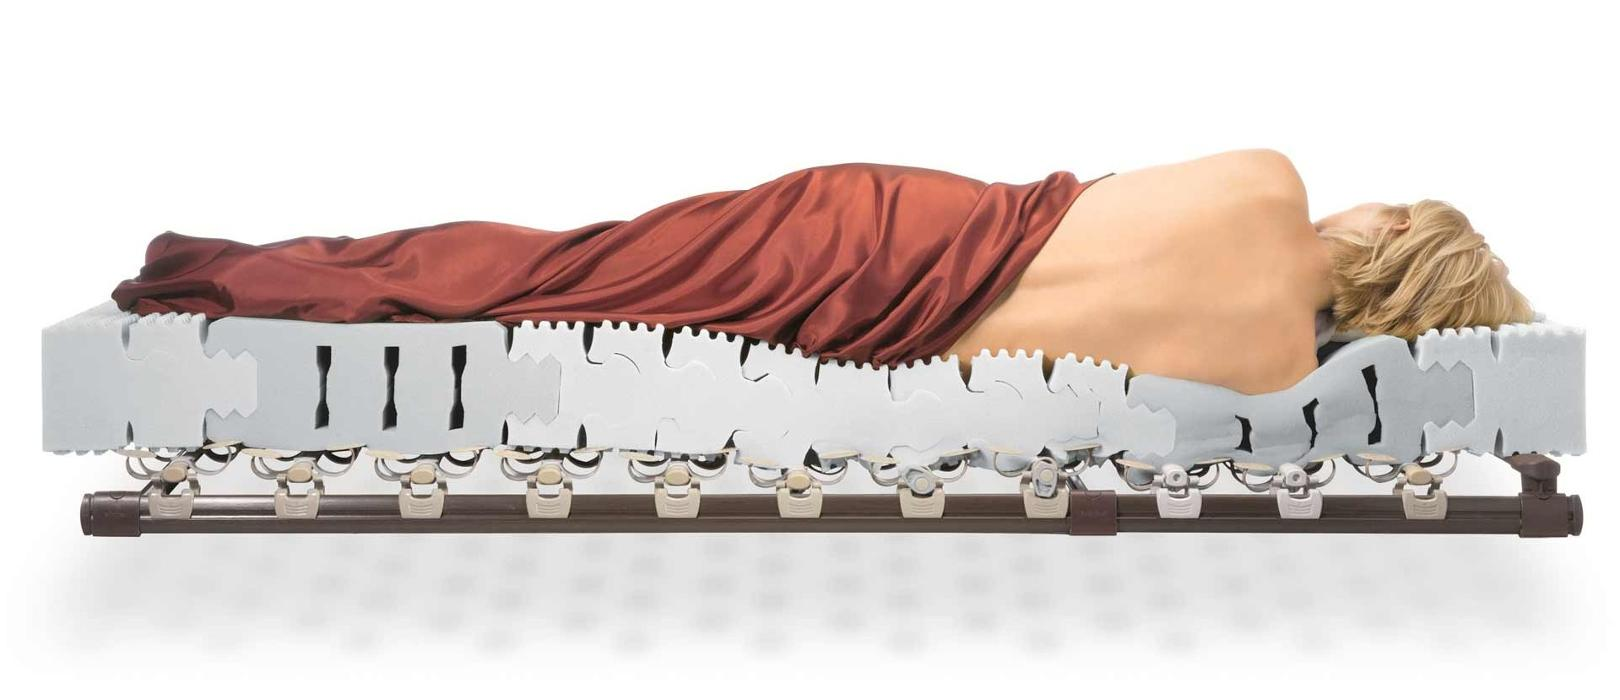 matratzen concord gmbh in bonn belderberg 11. Black Bedroom Furniture Sets. Home Design Ideas